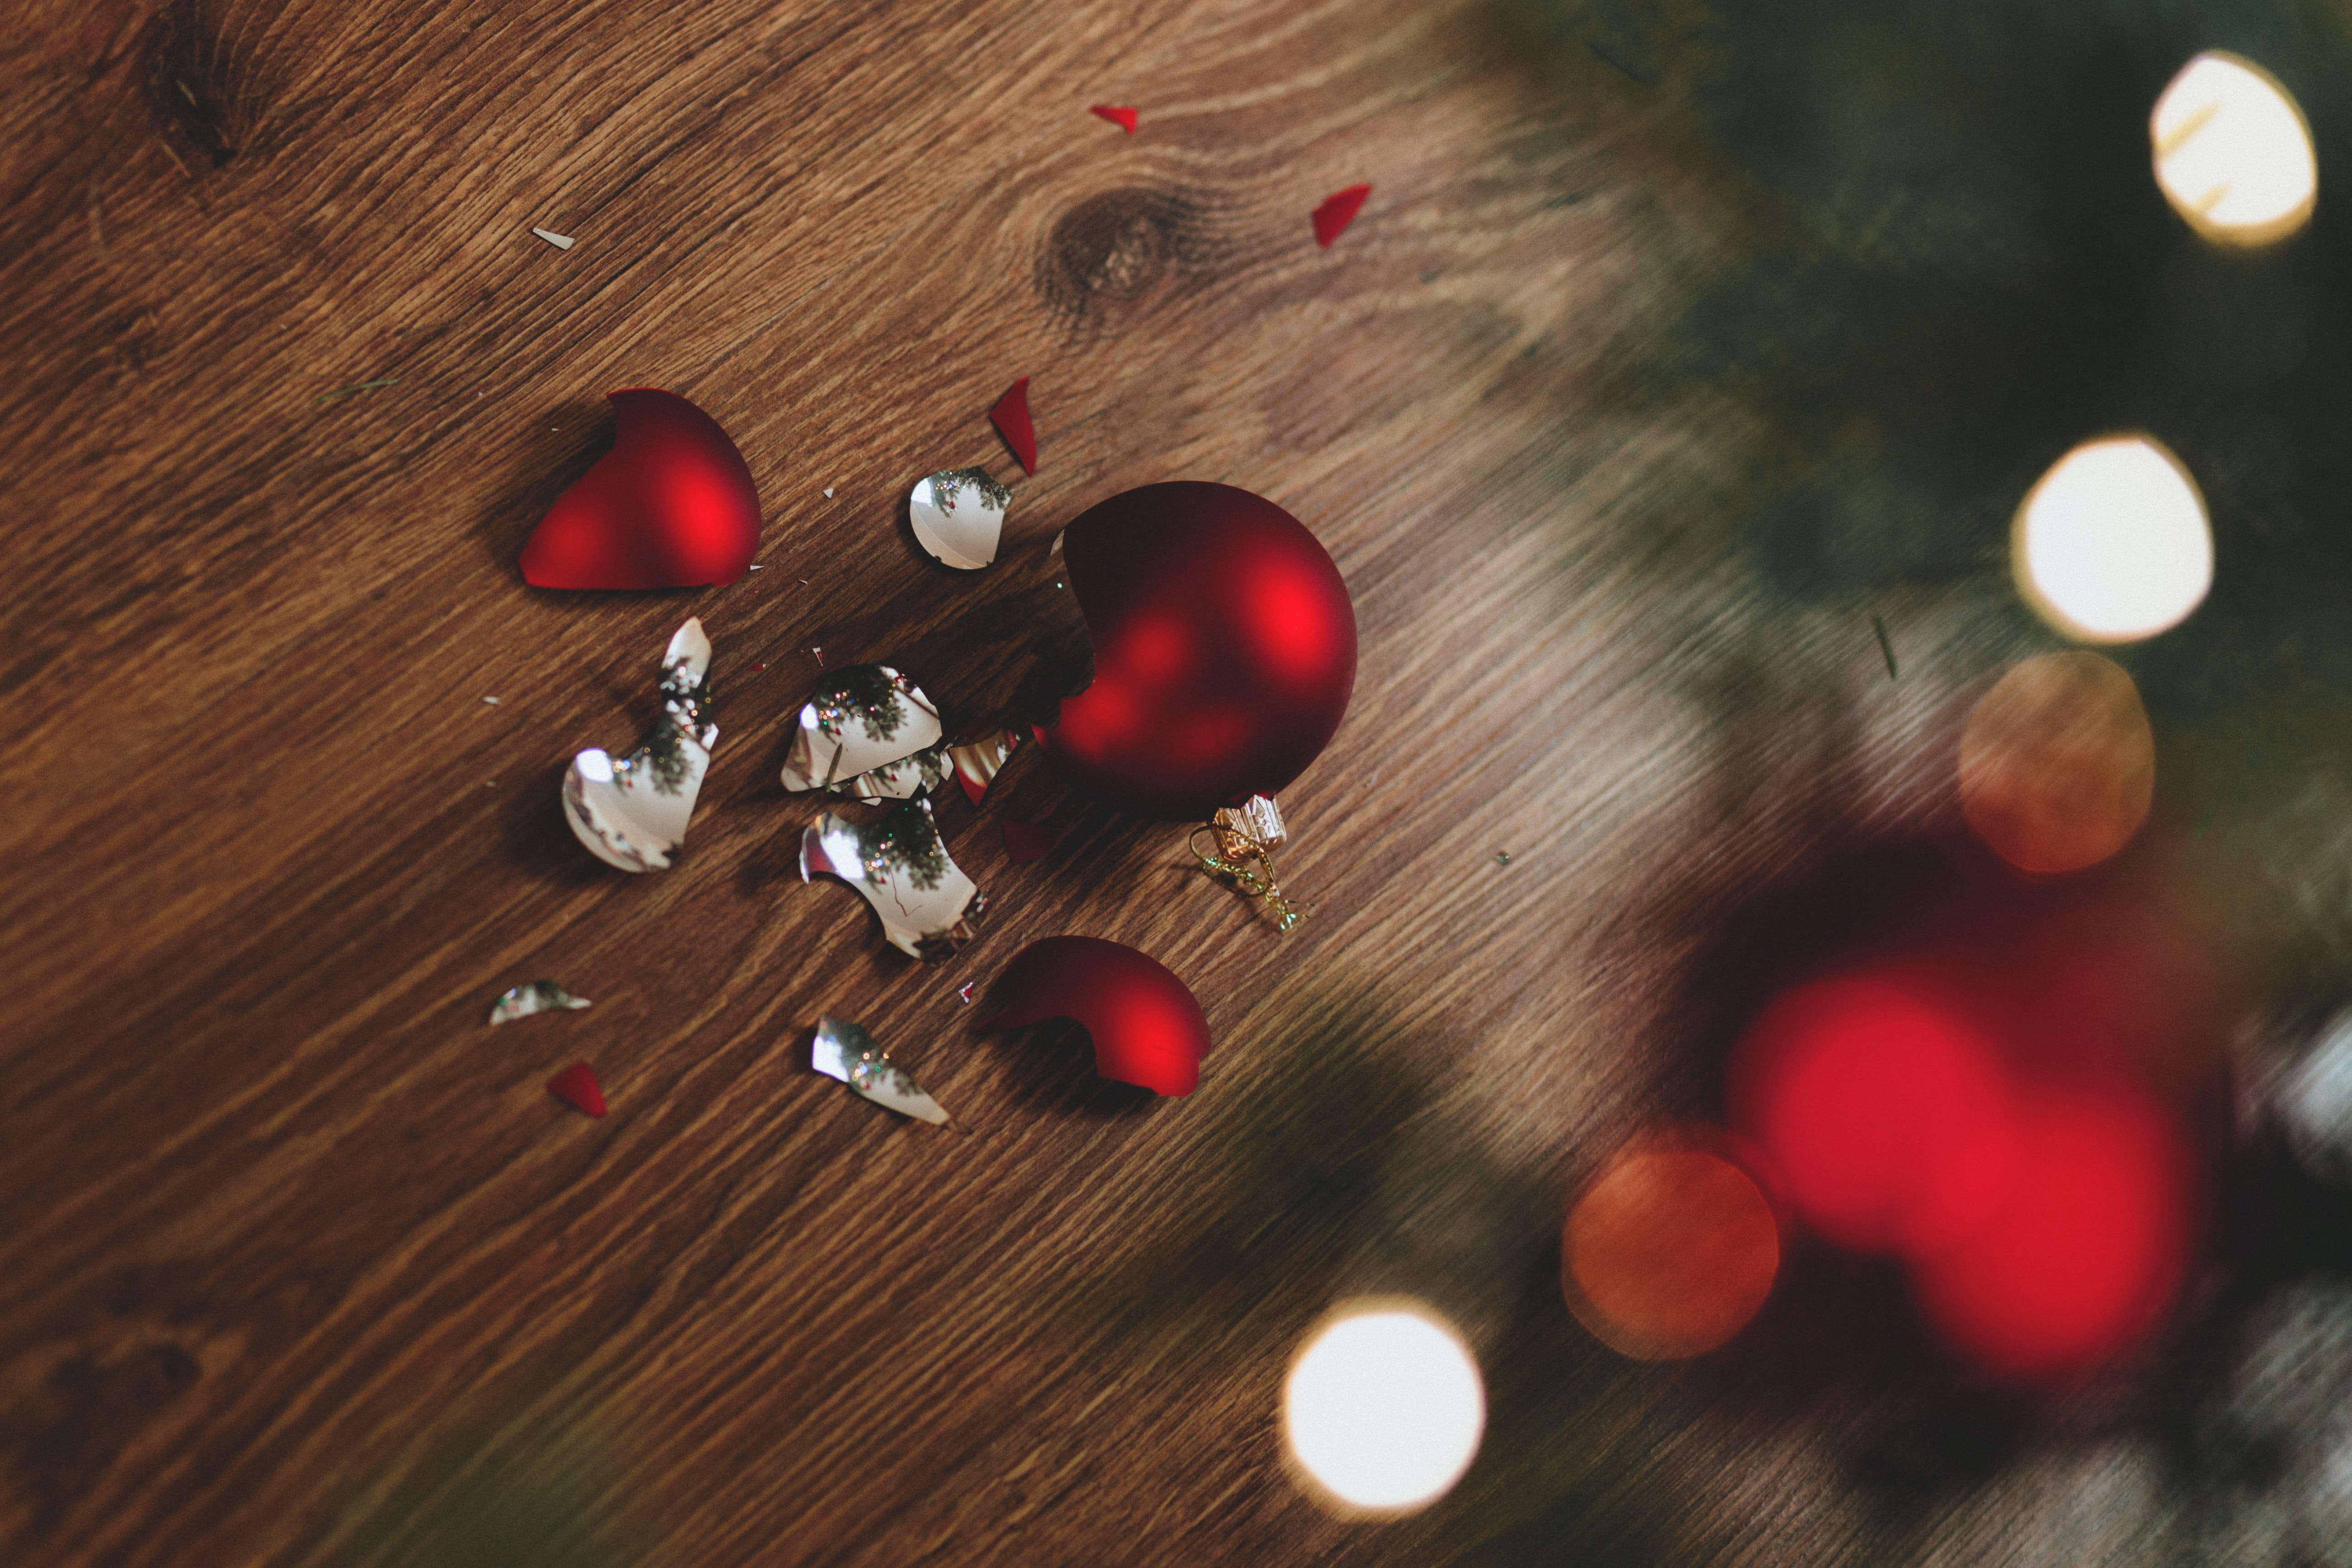 Broken red Christmas baubles.